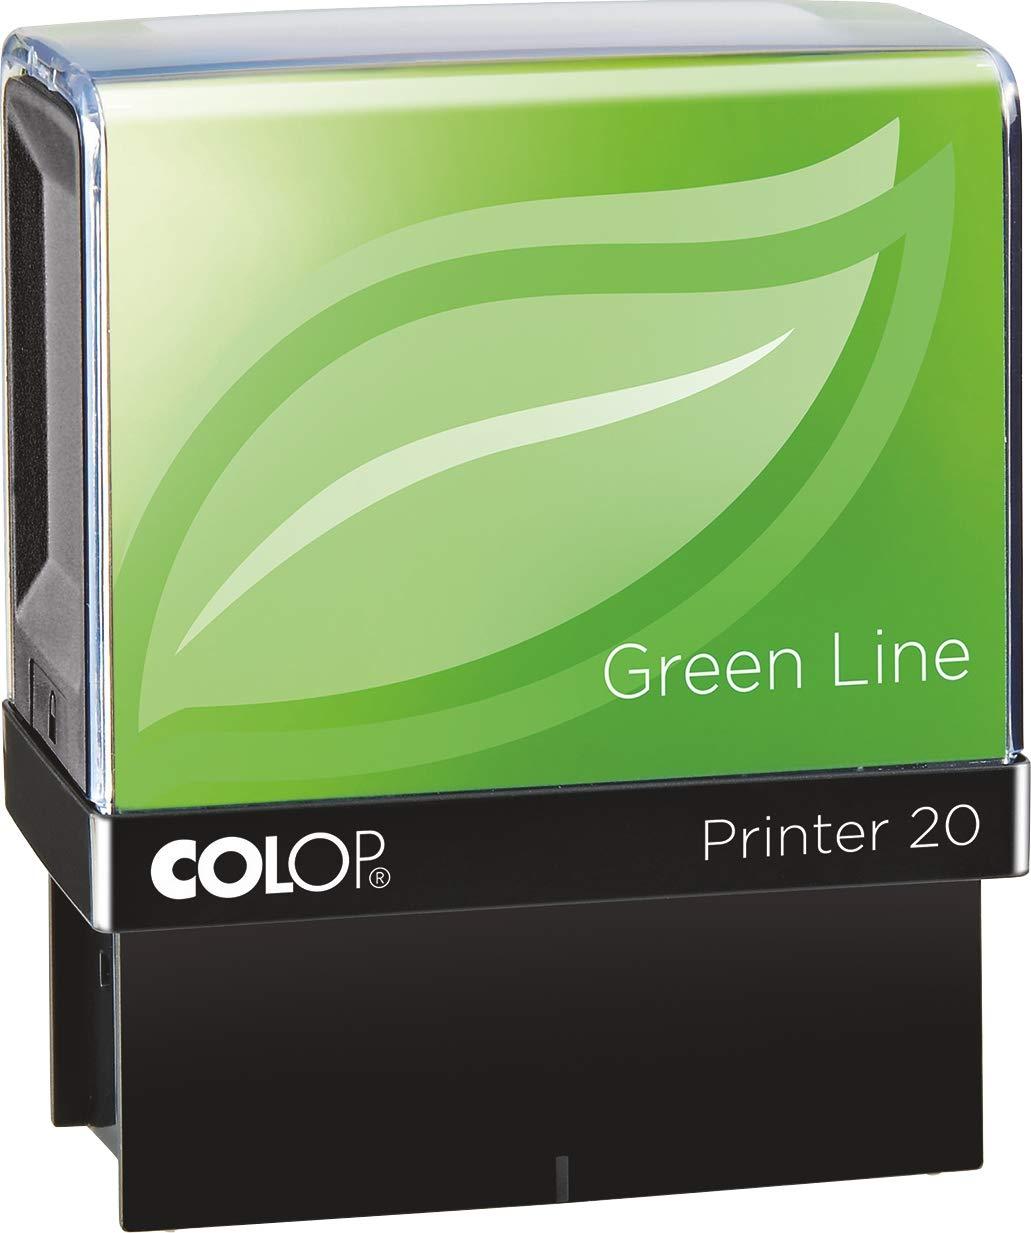 COLOP プリンター 20 エアメール グリーン ライン スタンプ - レッドインク   B07N7X8J8J